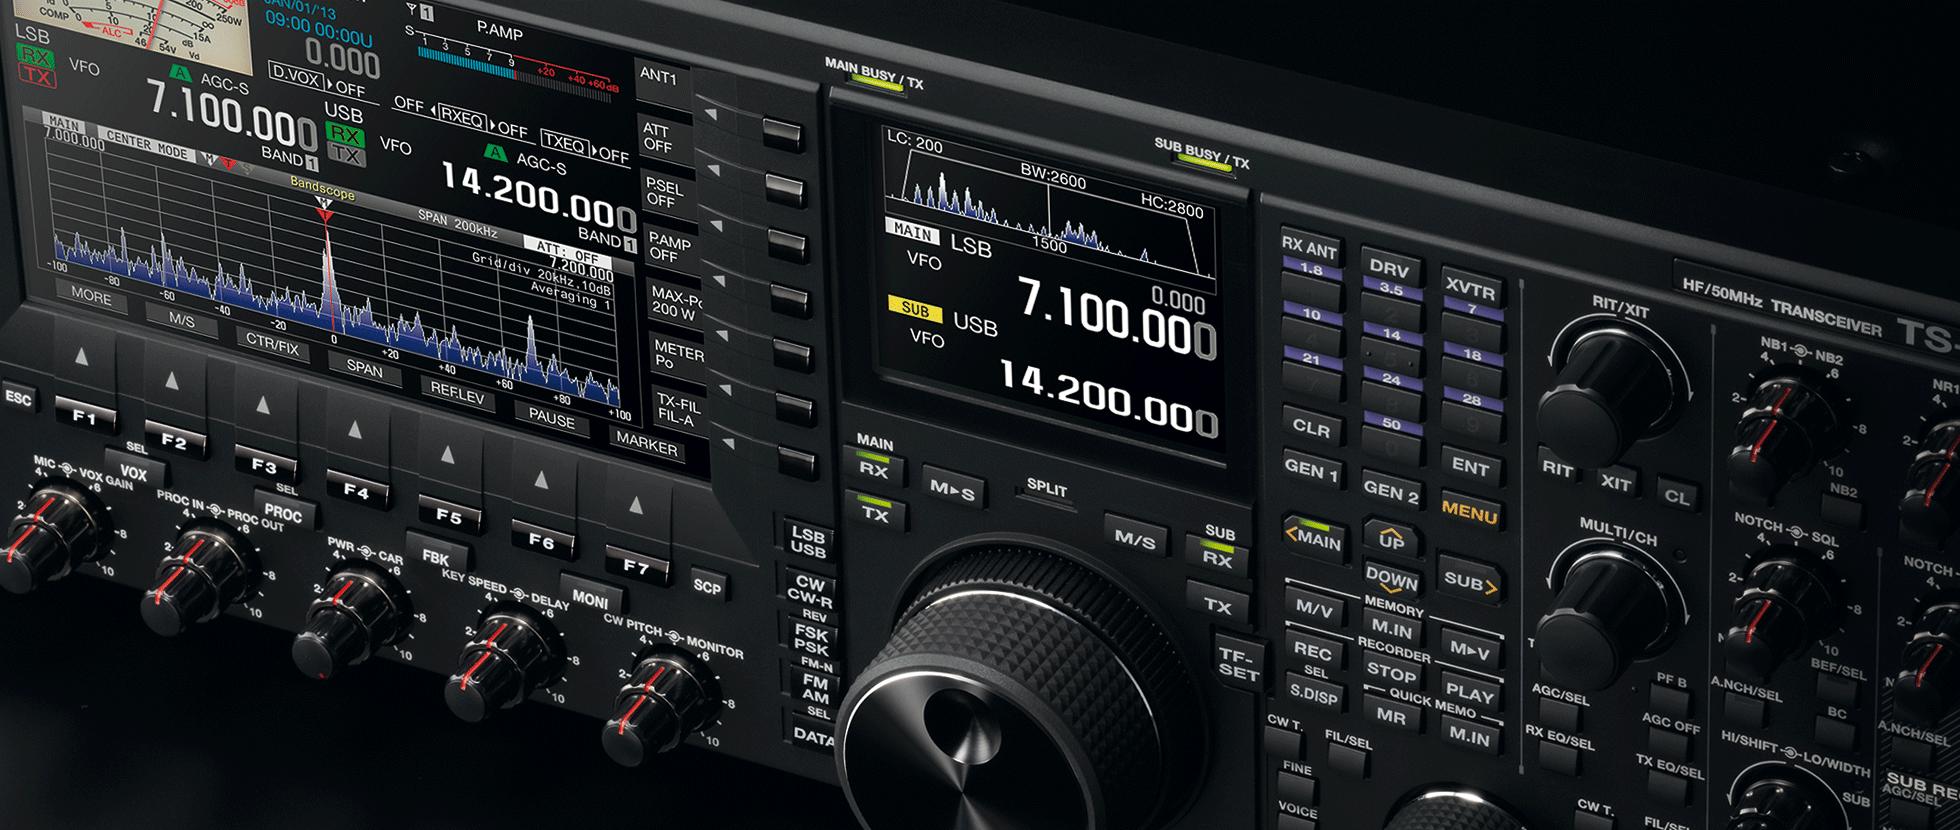 TS-990